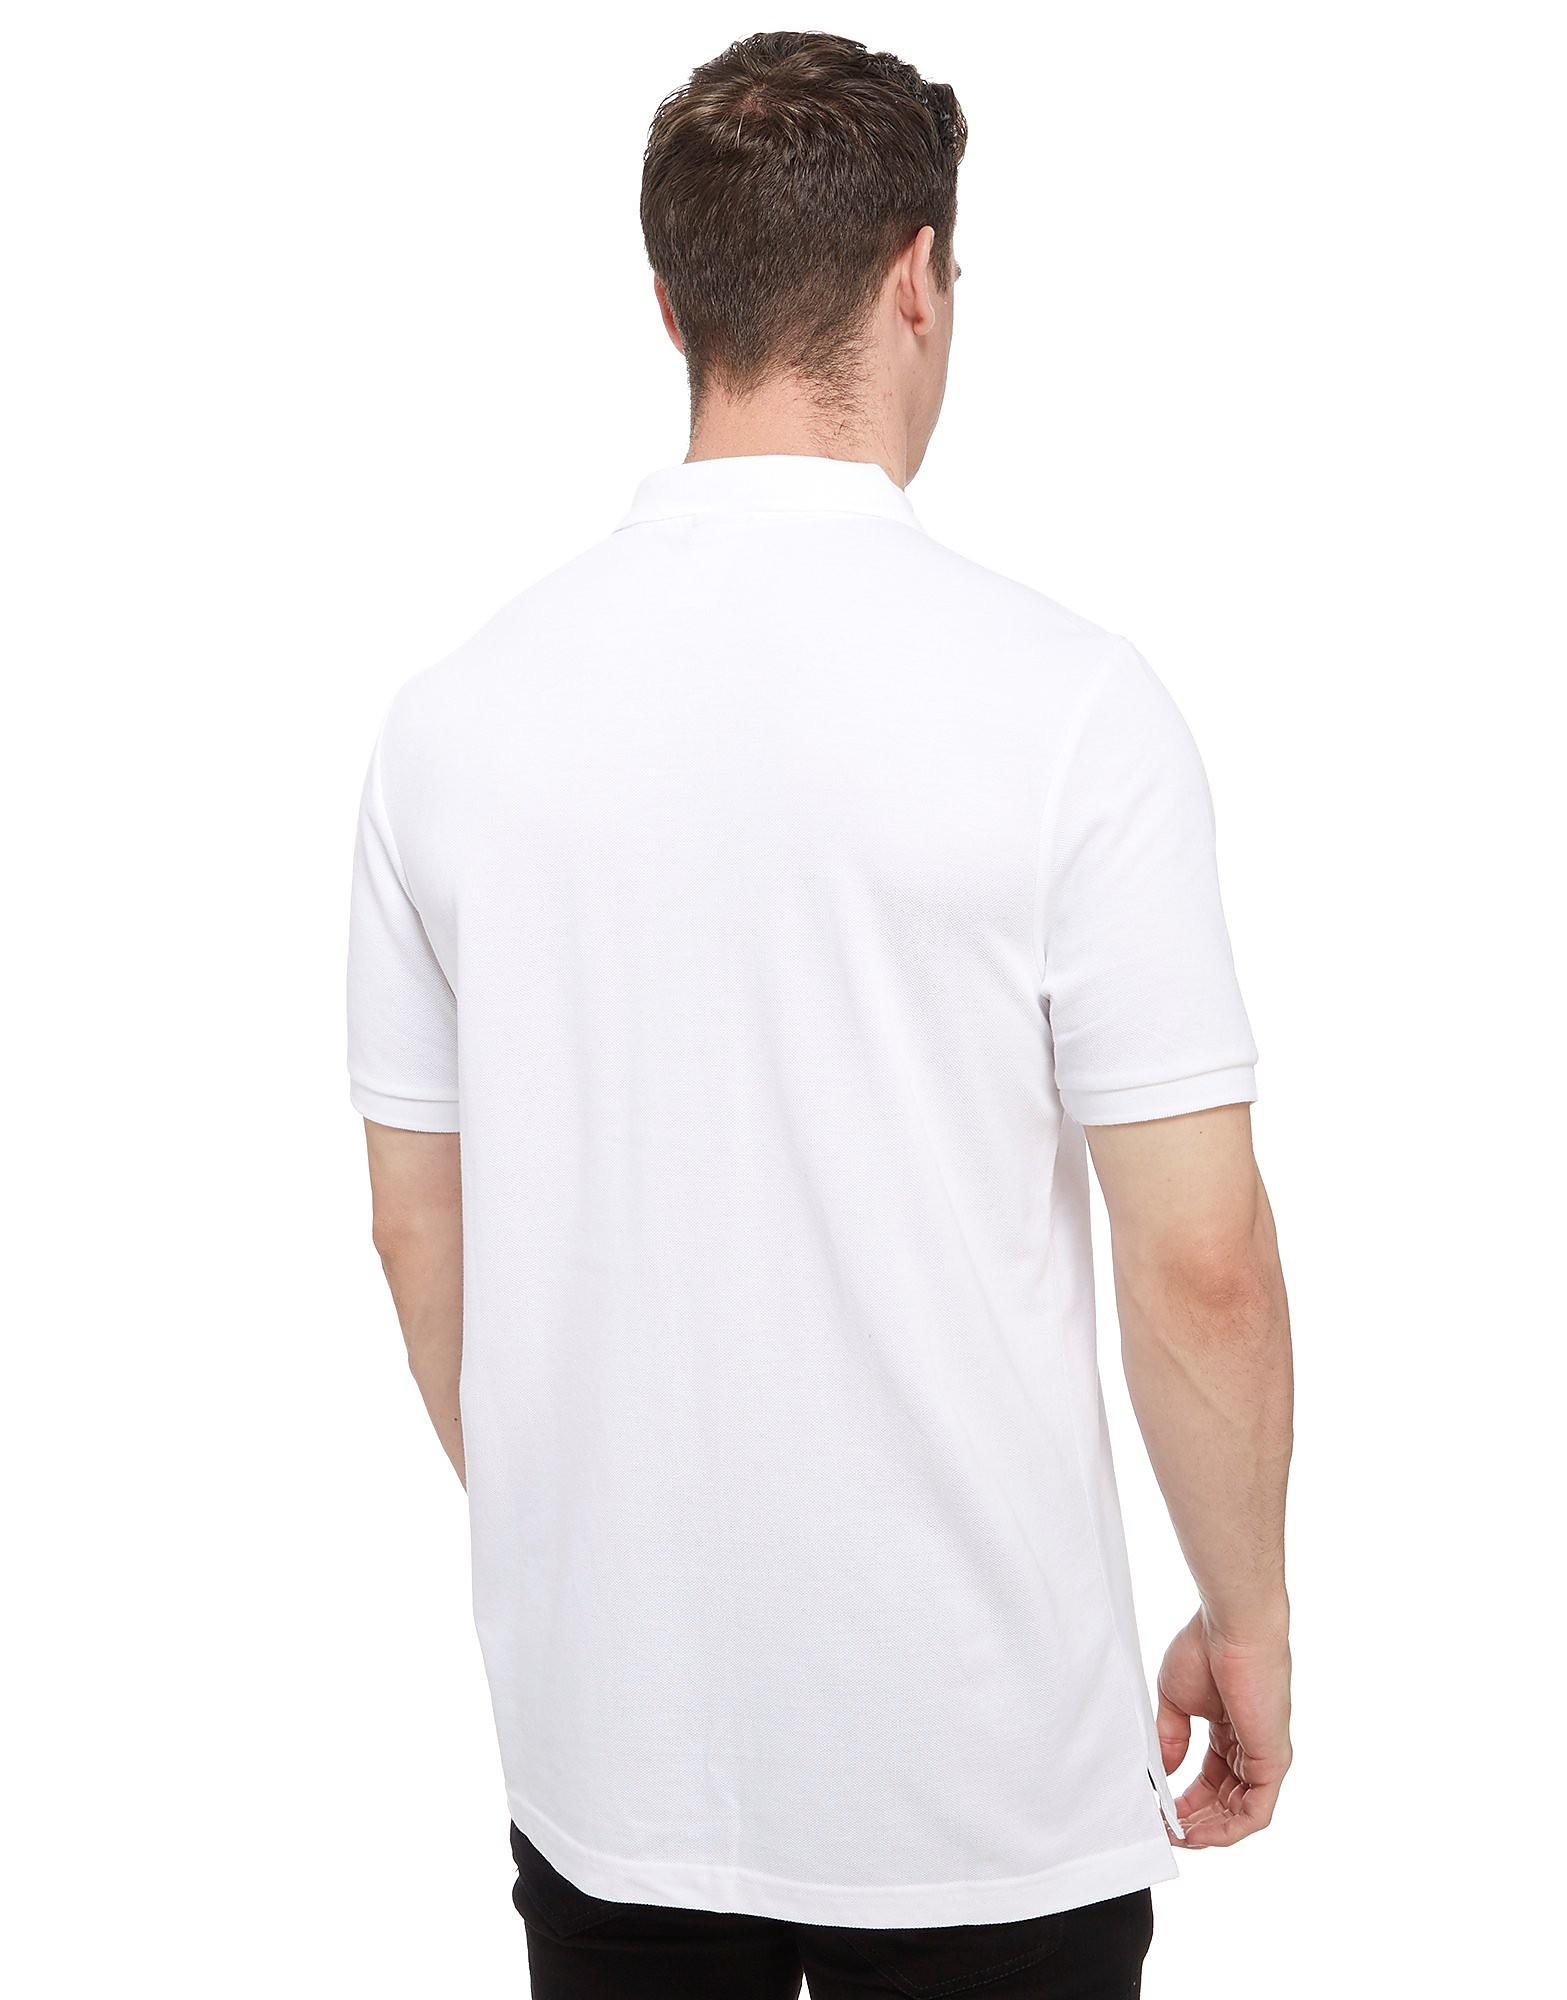 Nike Tottenham Hotspur FC 2017 Core Polo Shirt